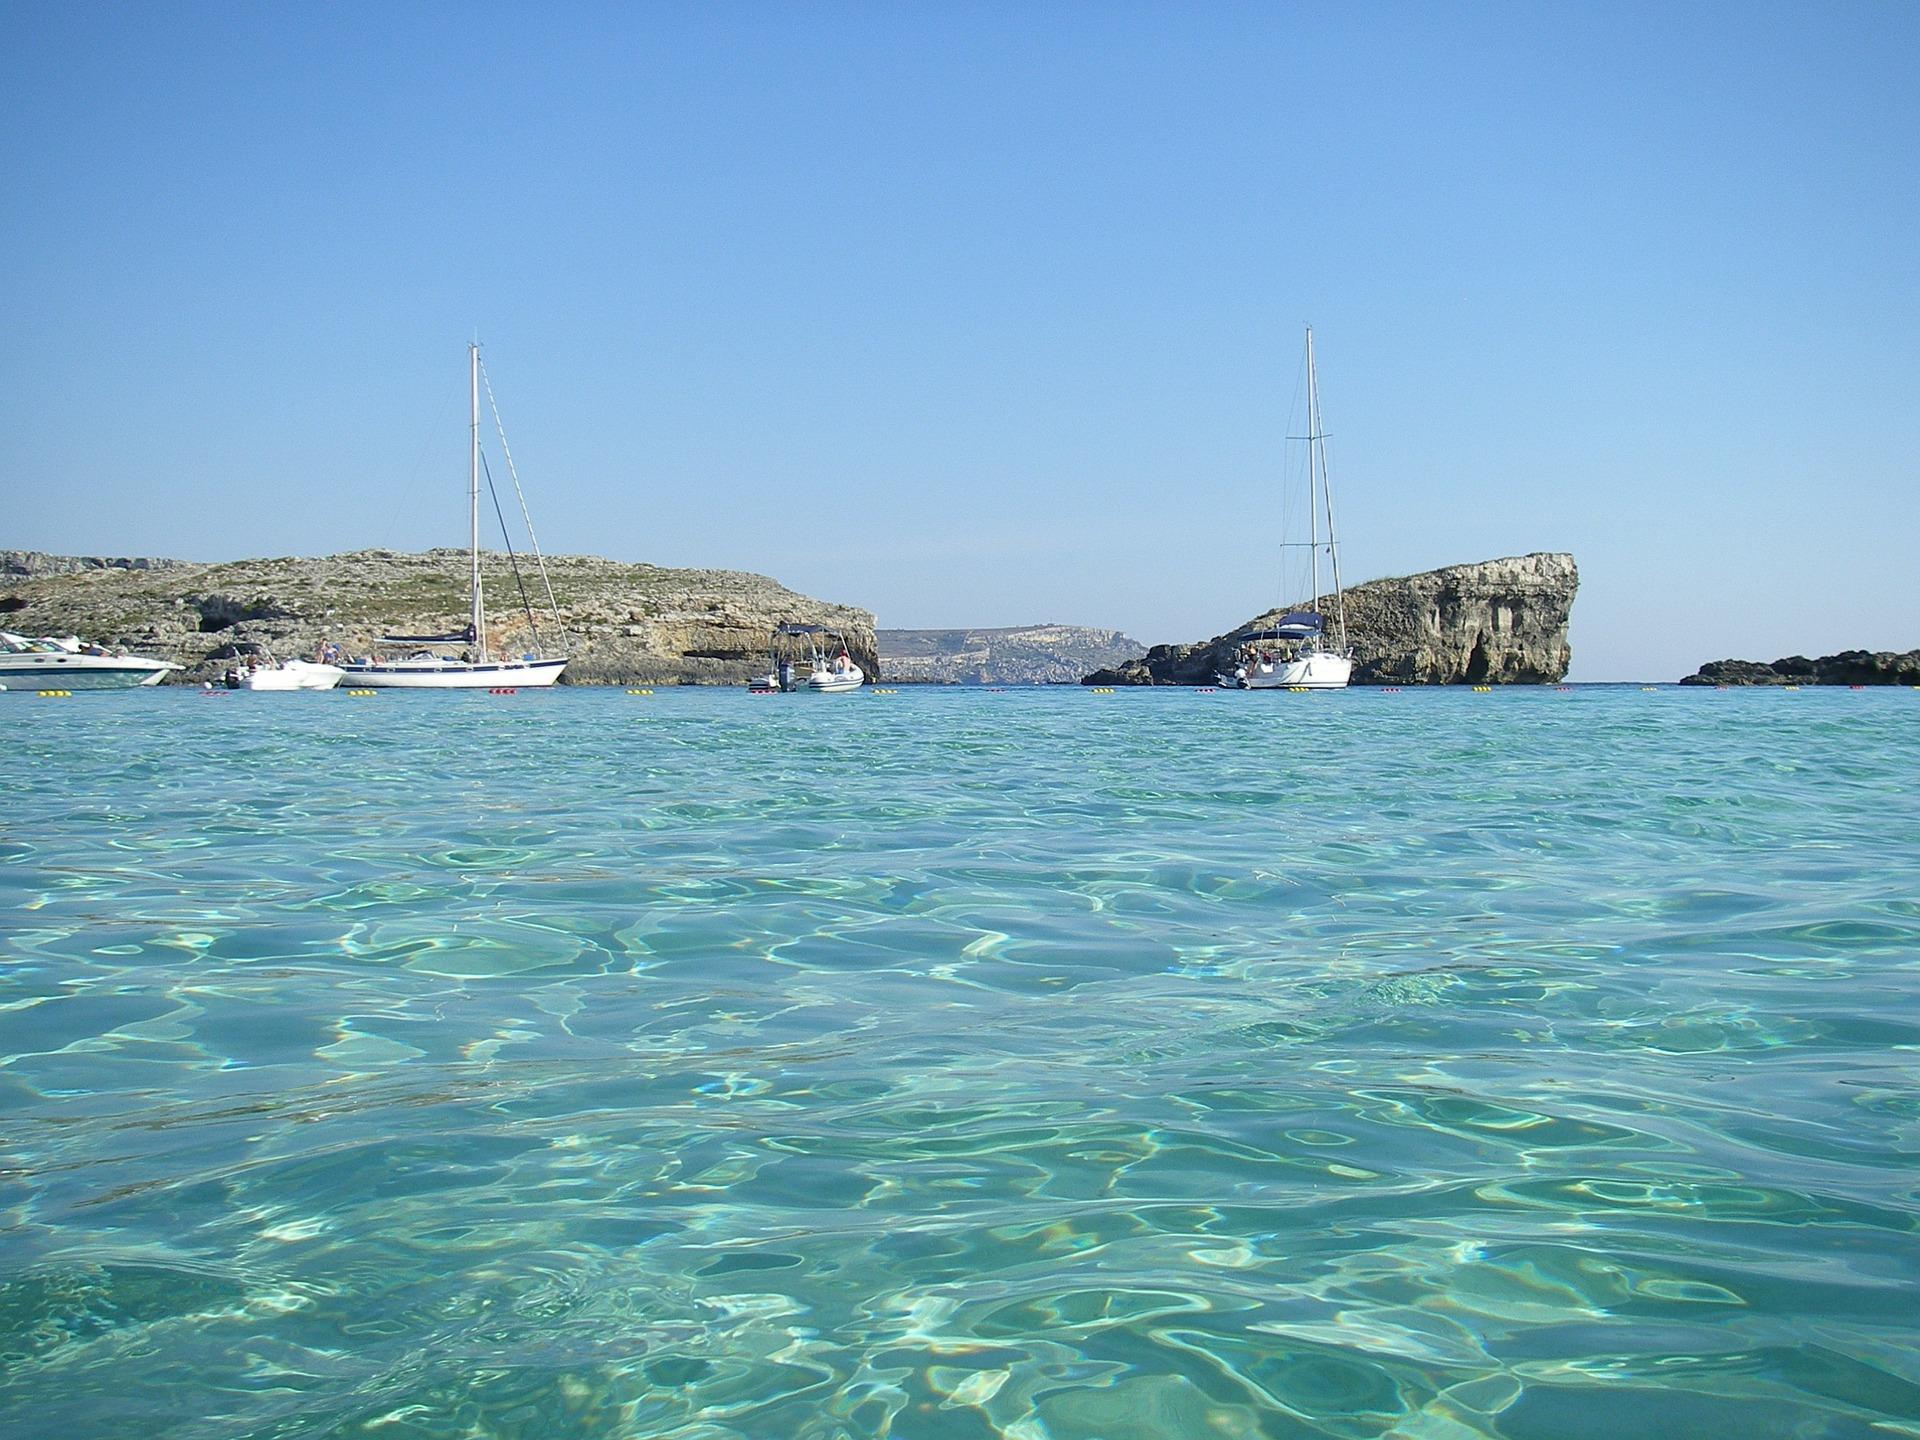 Malta Passport invest 1 (2).jpg